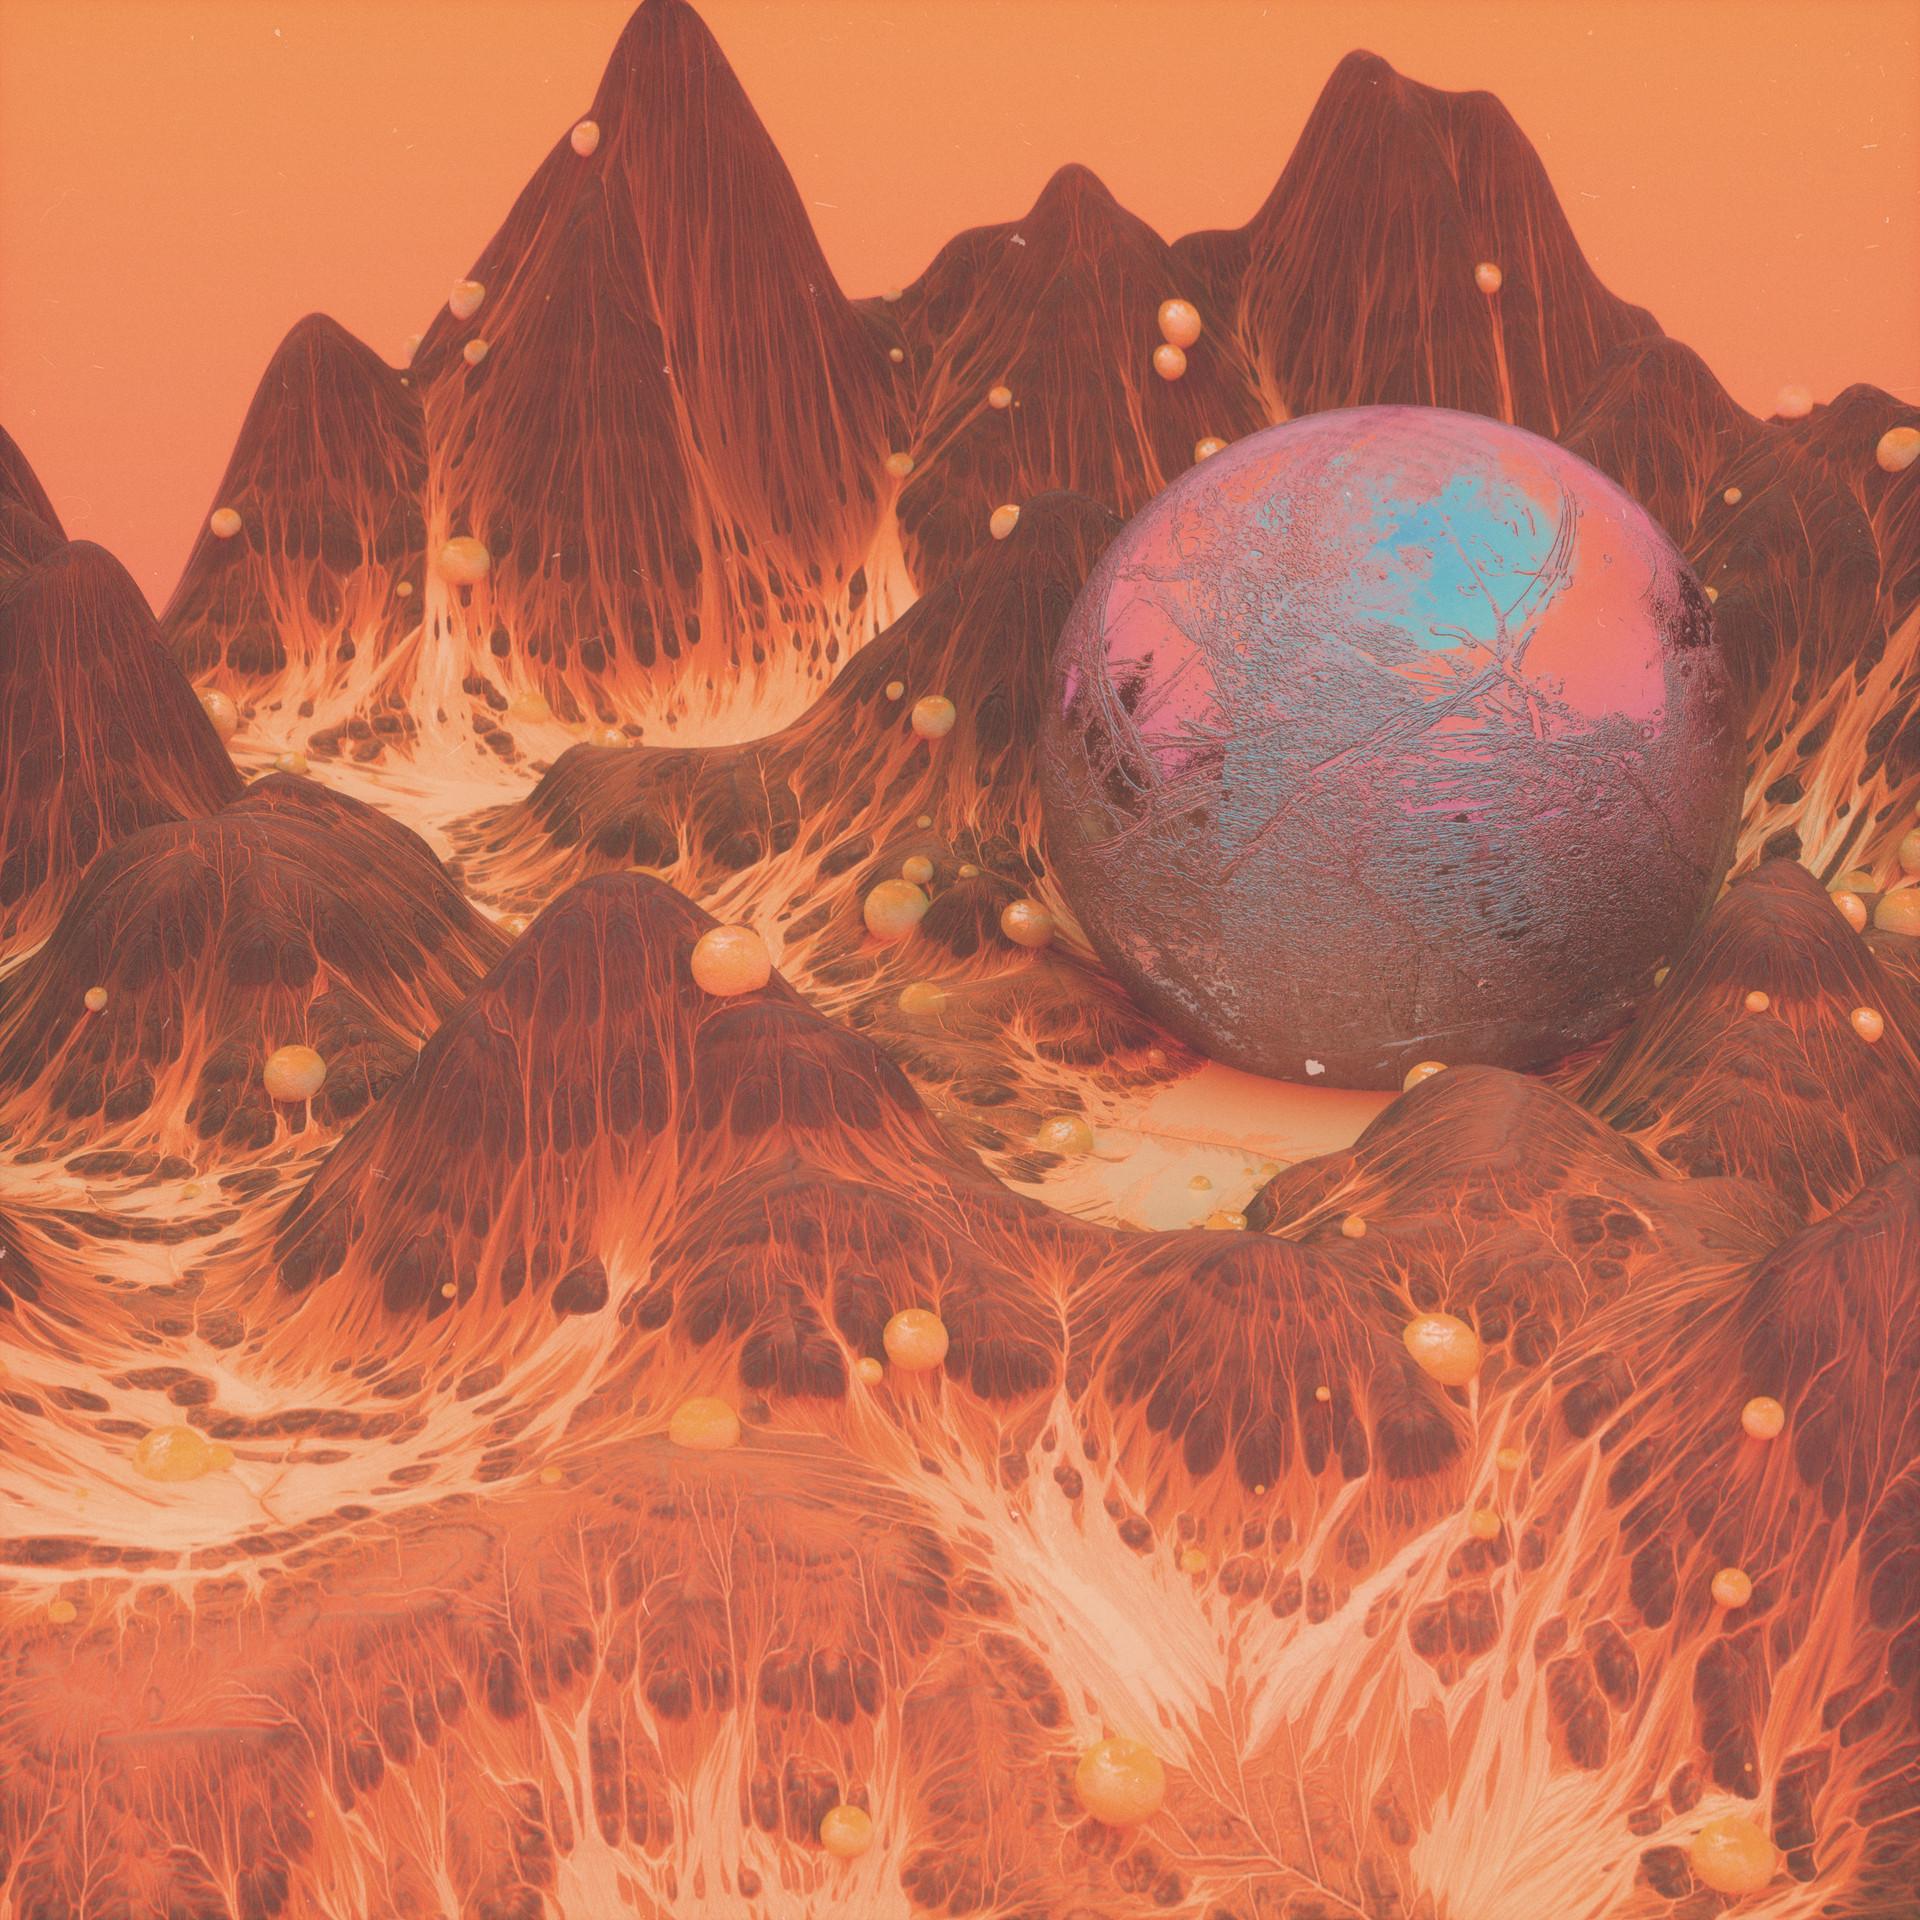 //Tangerine Dream